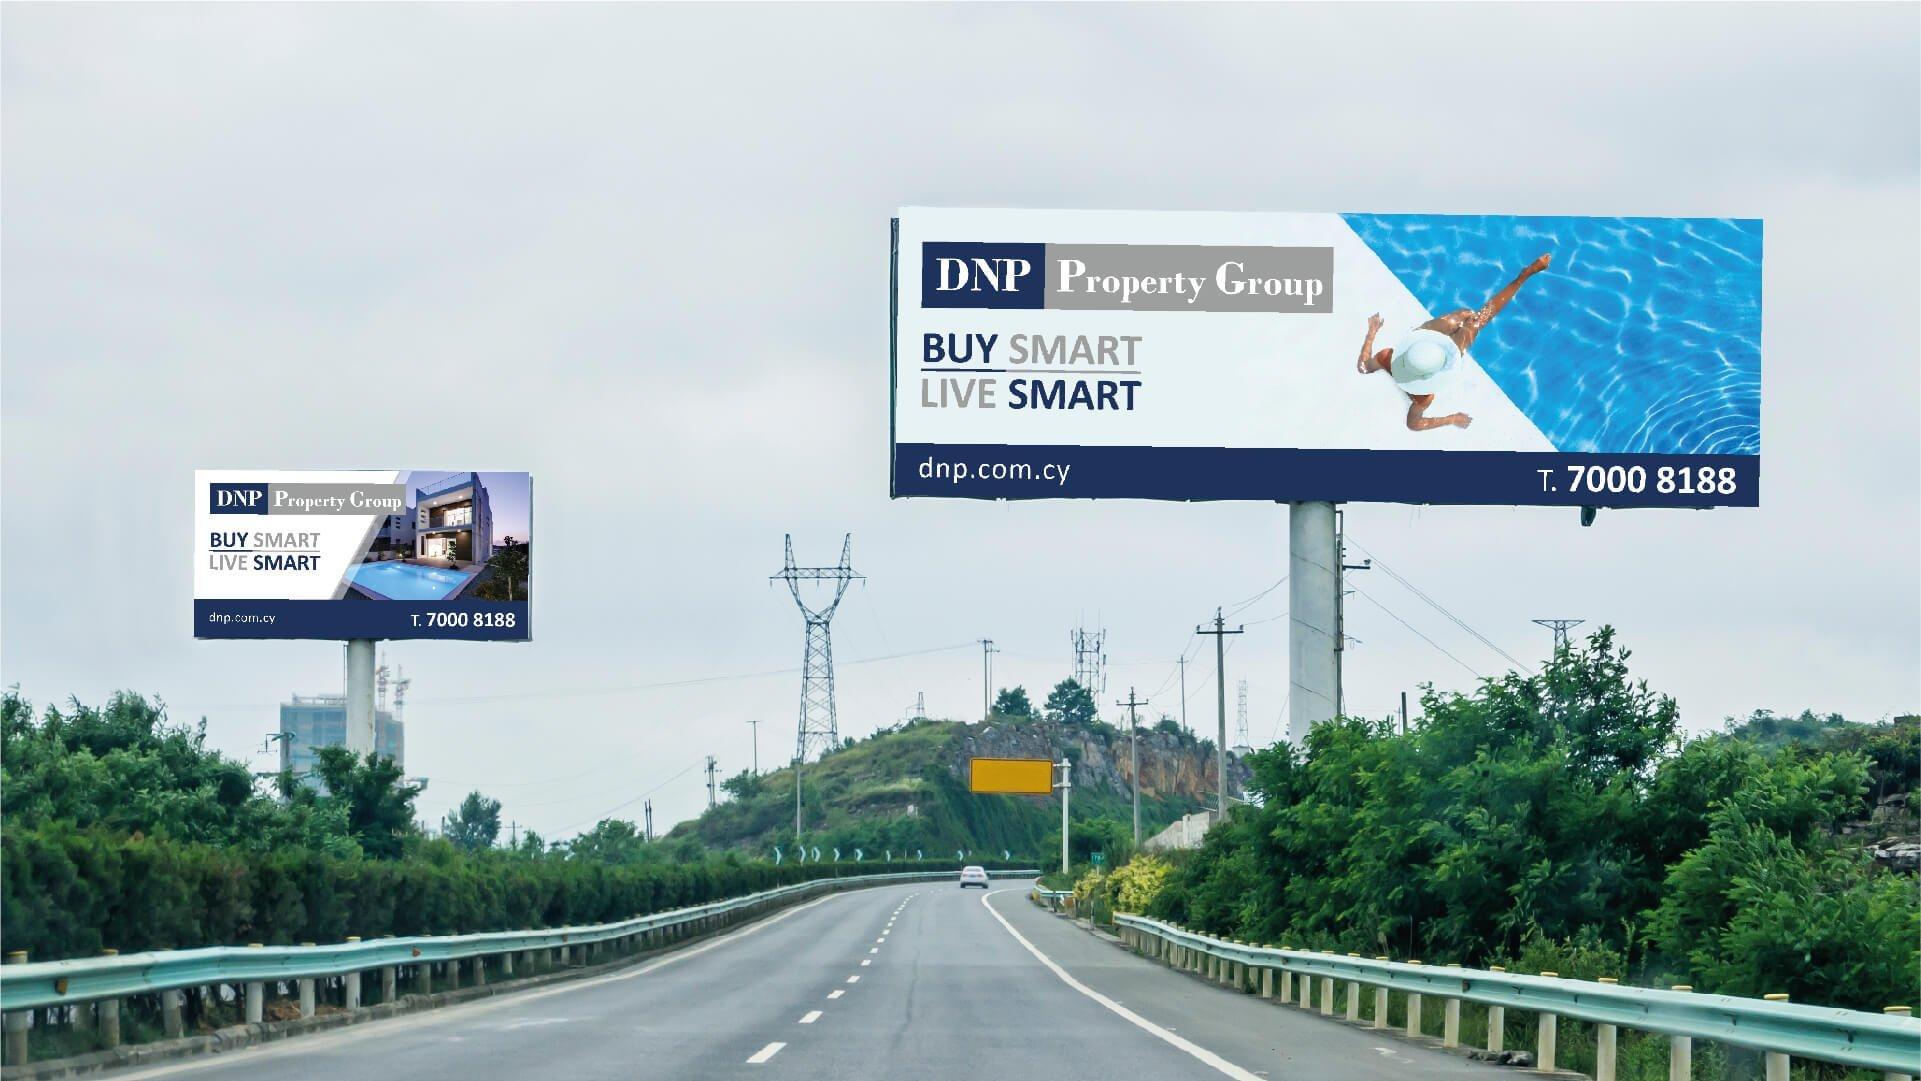 DNP billboards